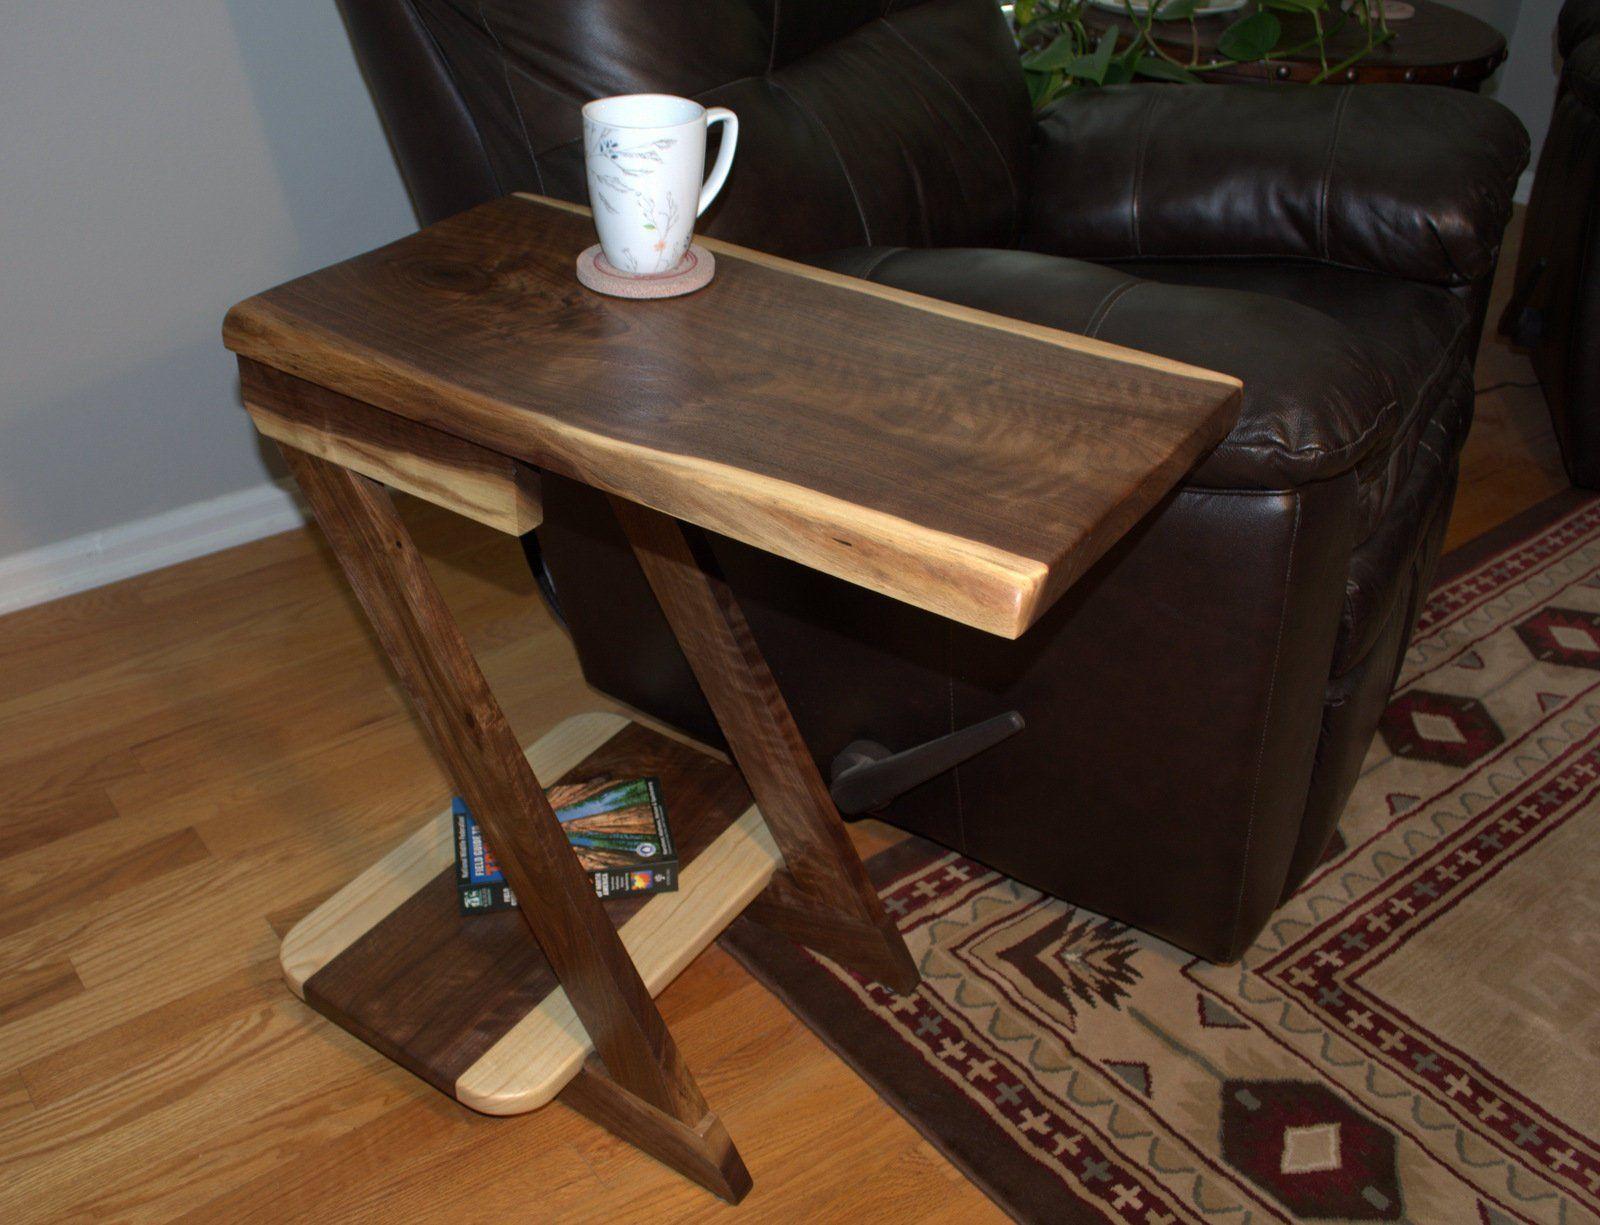 Side Table End Table Small Table Wood Table Livingroom Table